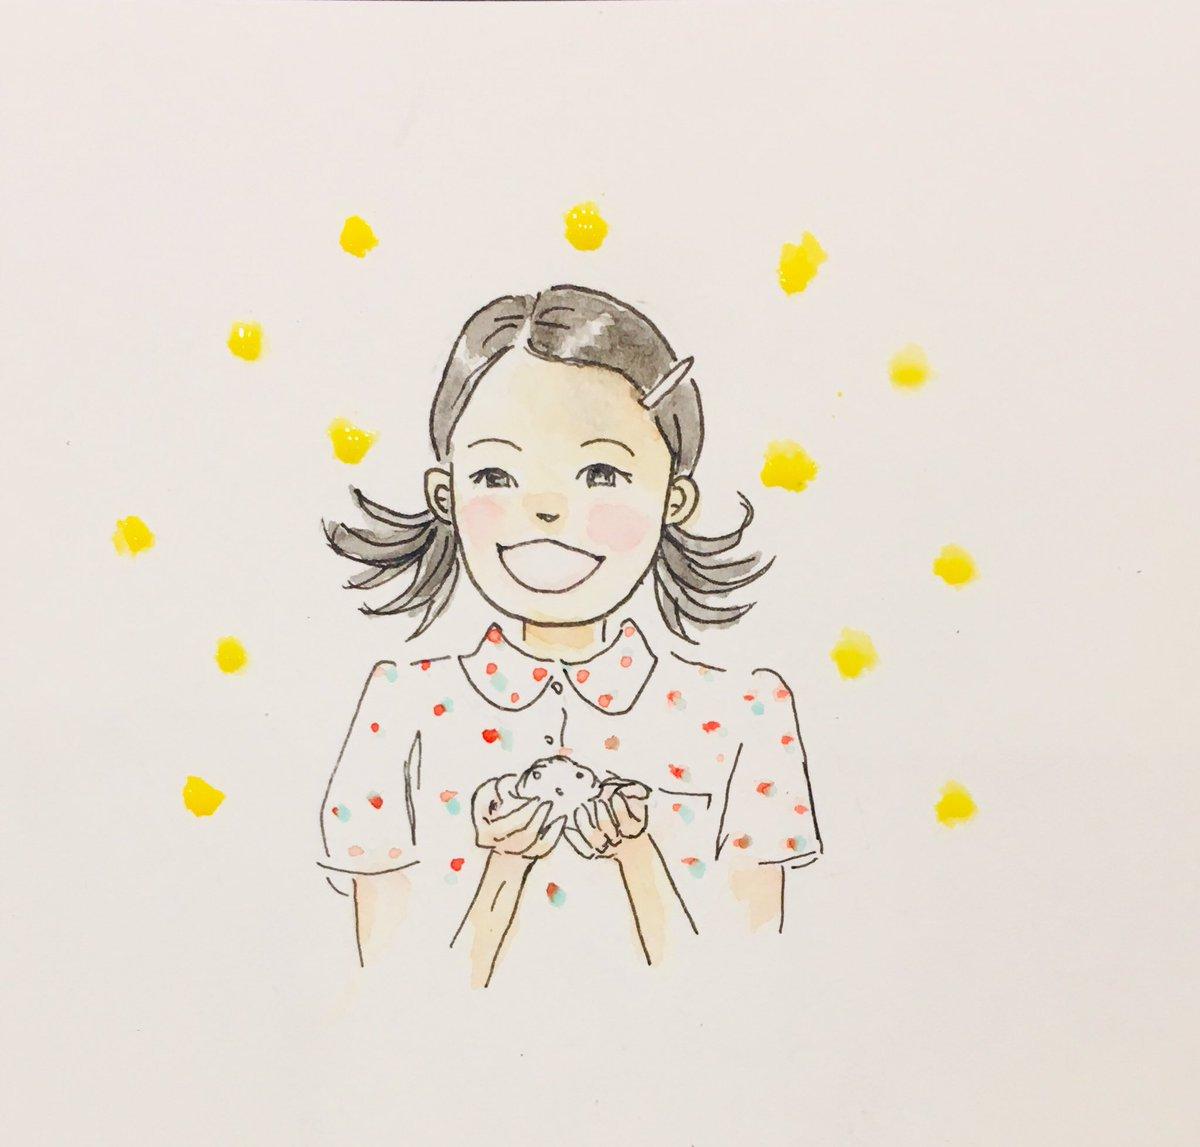 RT @oekakishiratama: 癒しのタカちゃんをおいておく。  #まんぷく #ぷく絵 https://t.co/s8JmFlUmBf